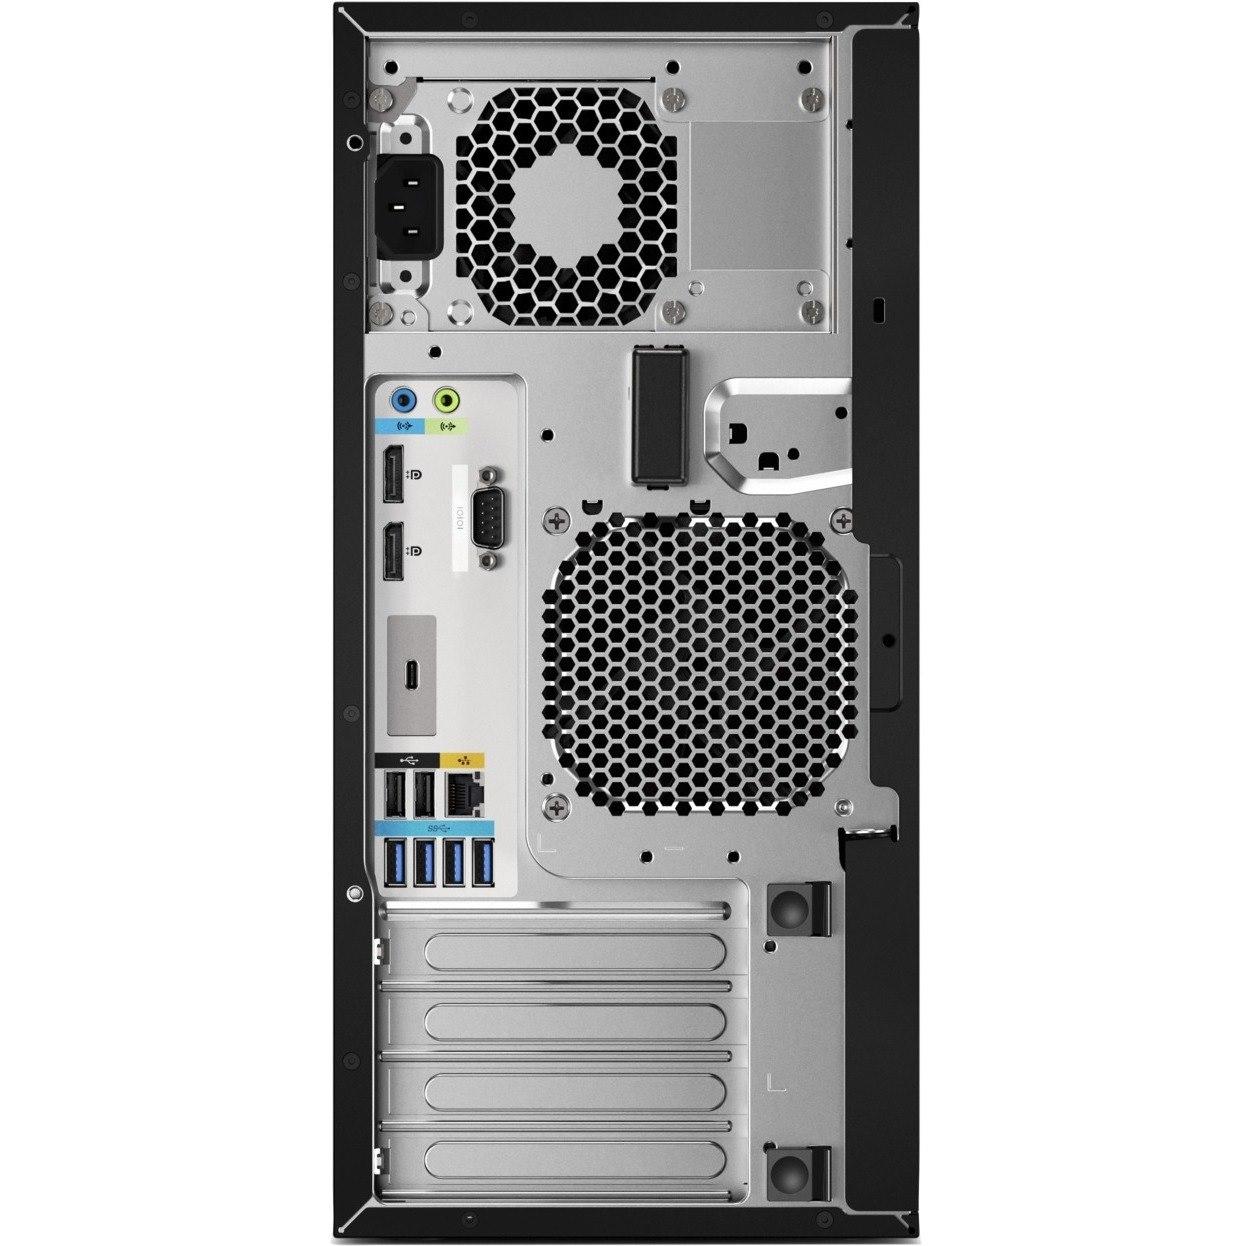 HP Z2 G4 Workstation - 1 x Xeon E-2236 - 32 GB RAM - 1 TB HDD - 512 GB SSD - Mini-tower - Black